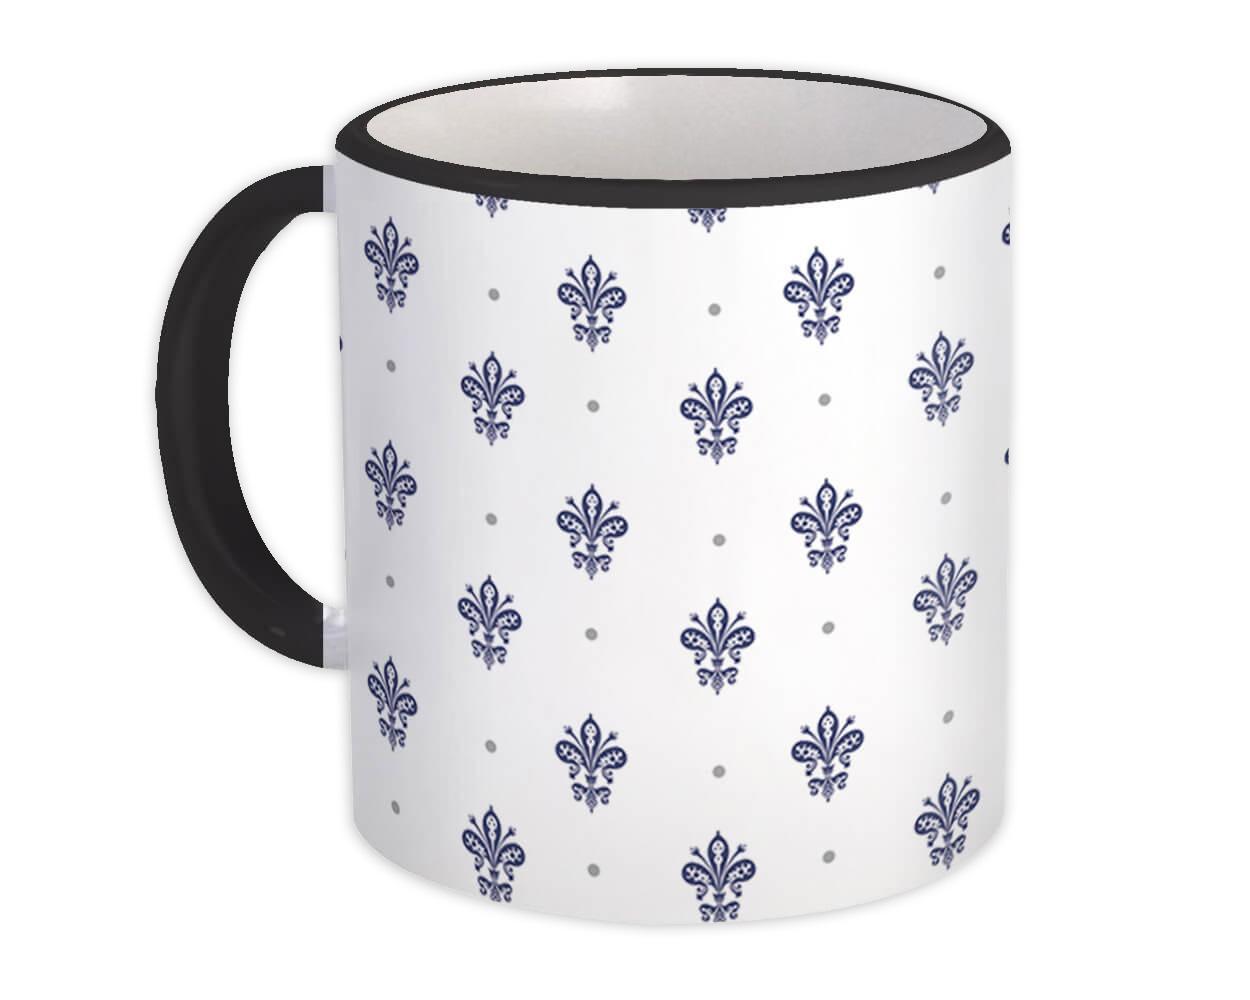 Fleur de Lis : Gift Mug Classic Home Decor Abstract Pattern Shapes Neutral